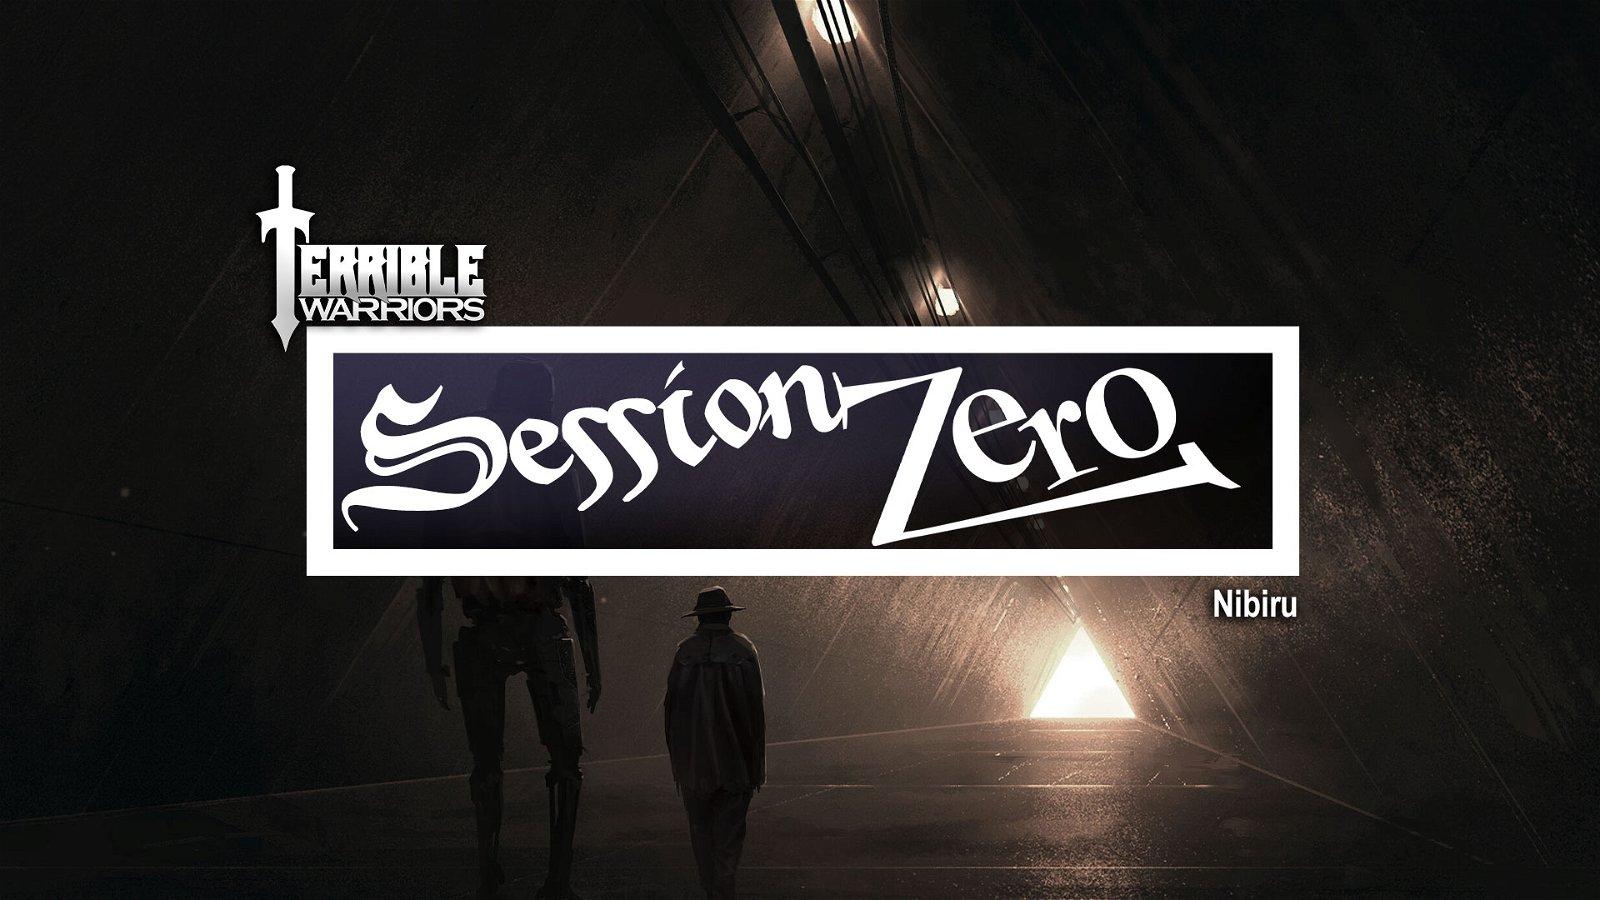 Terrible Warriors Podcast: Session Zero – Nibiru 1